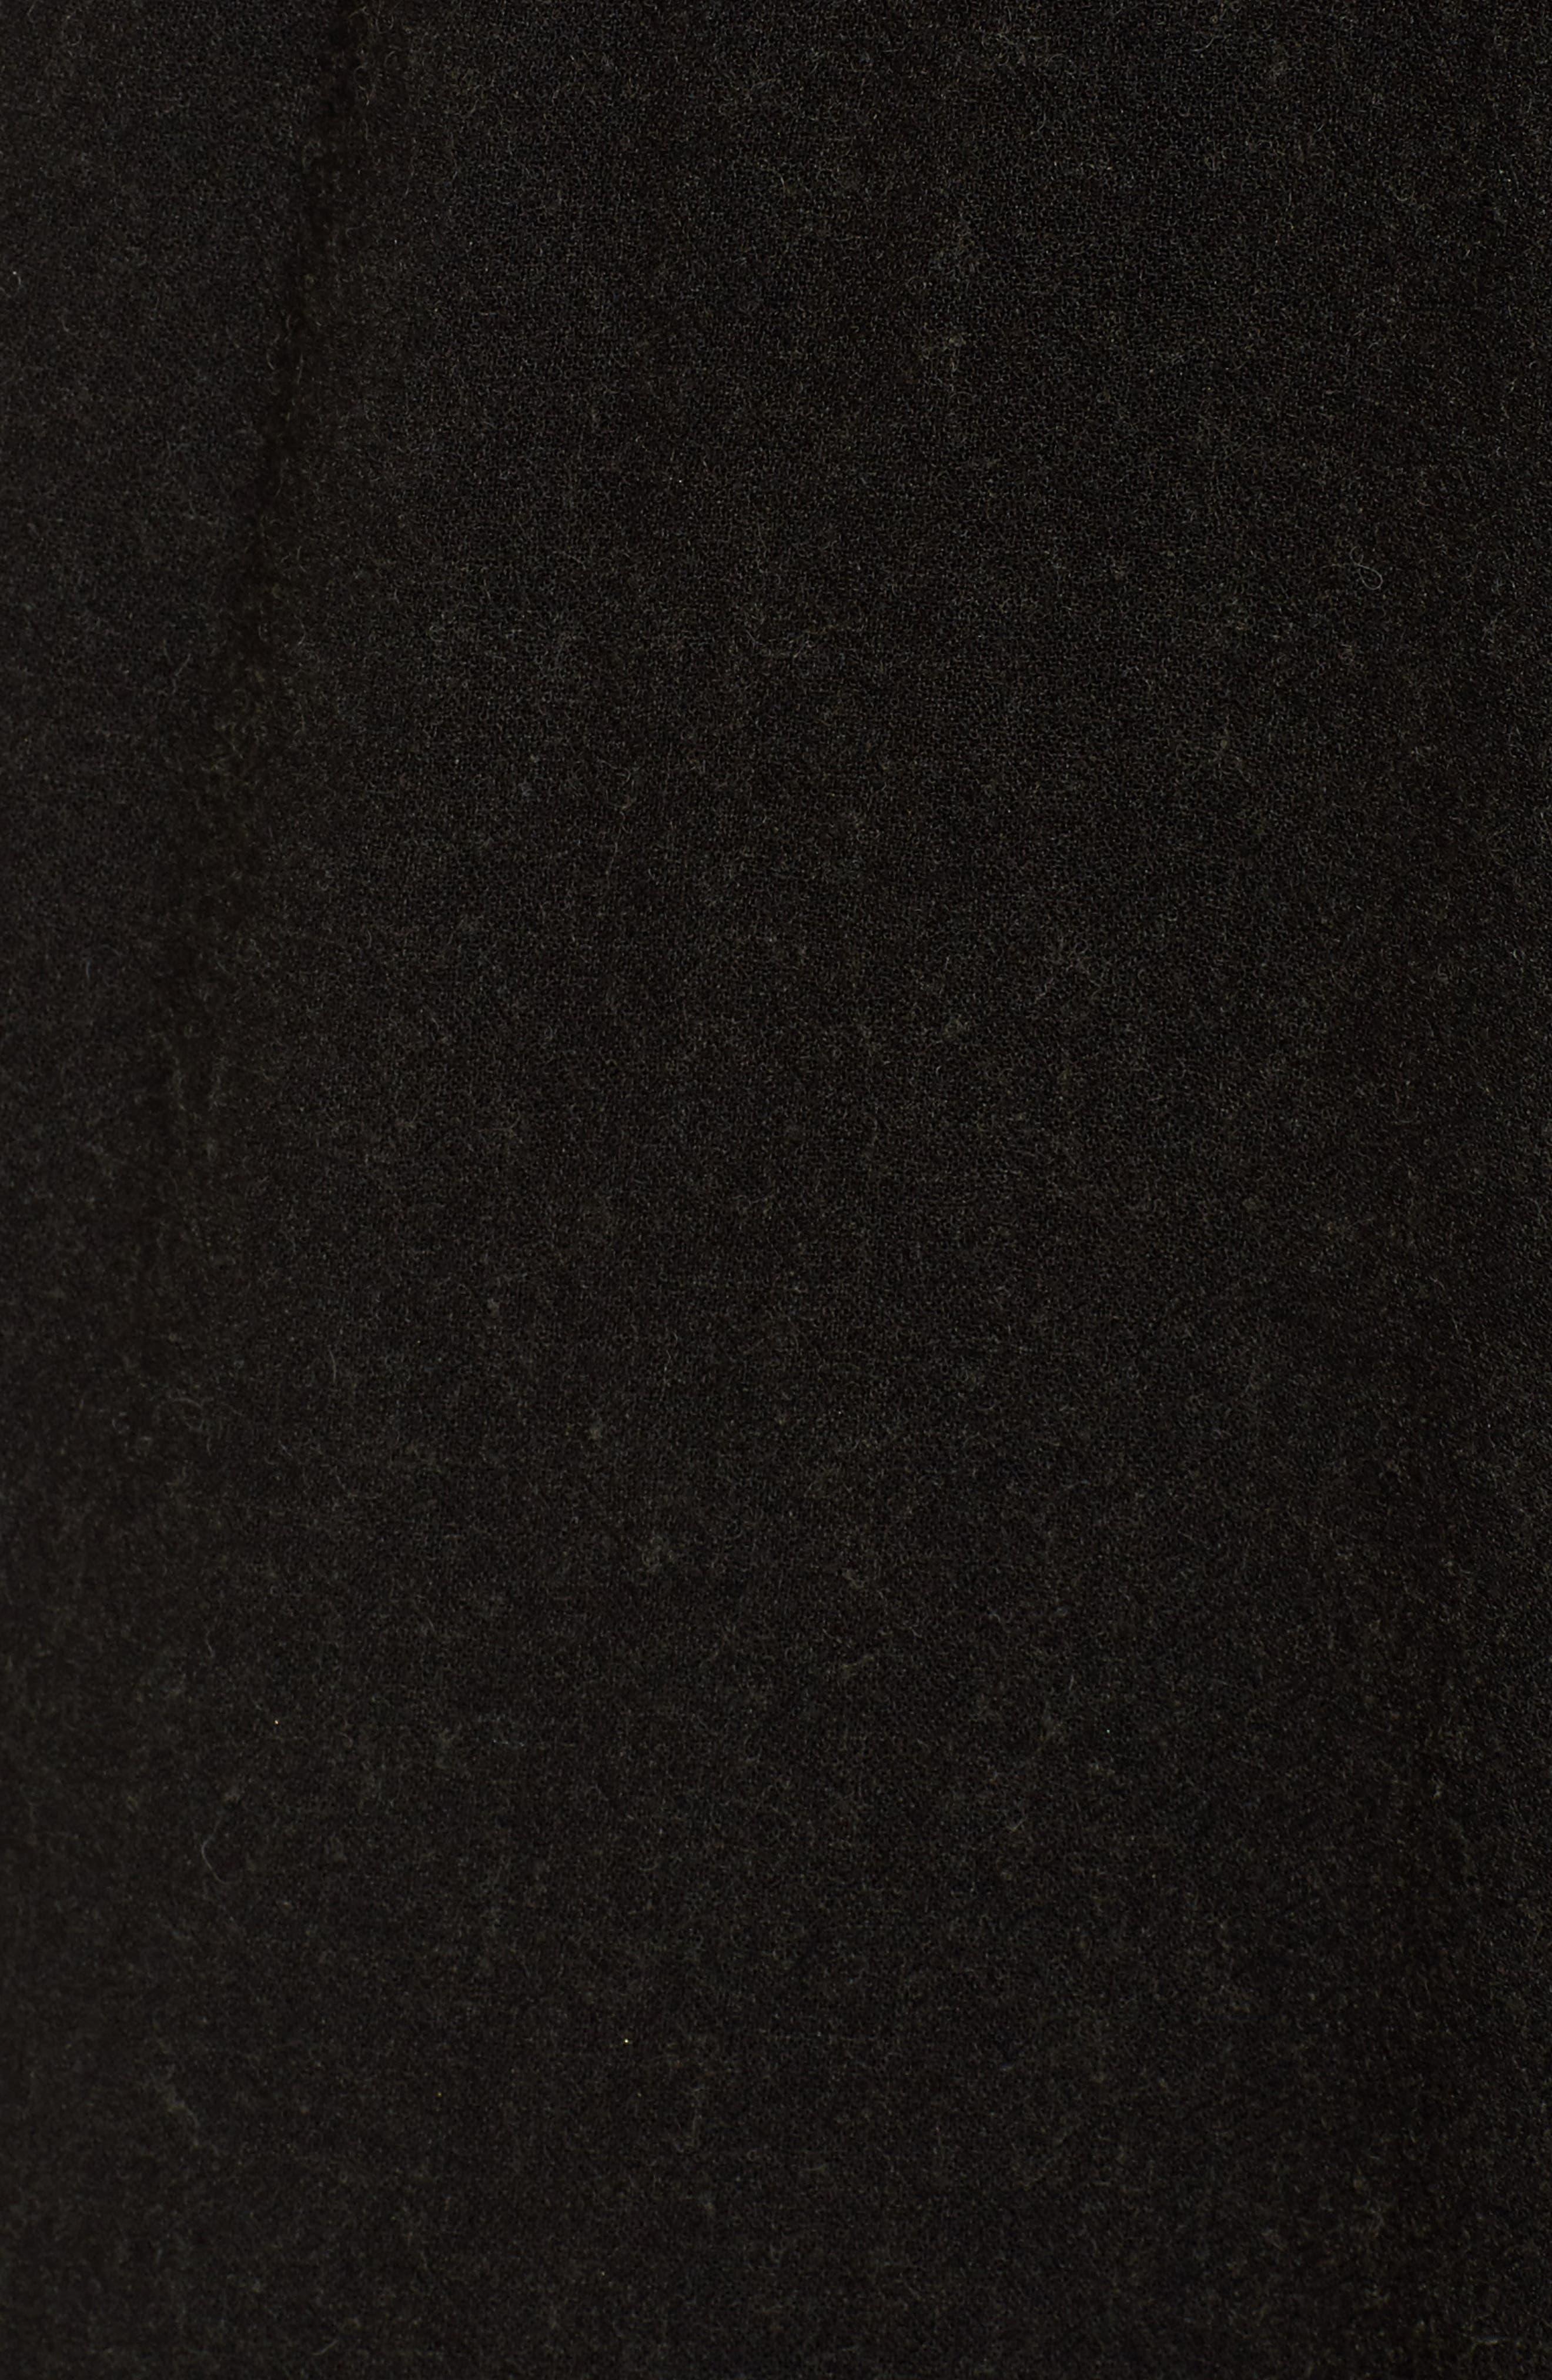 Midi Skirt,                             Alternate thumbnail 5, color,                             Black